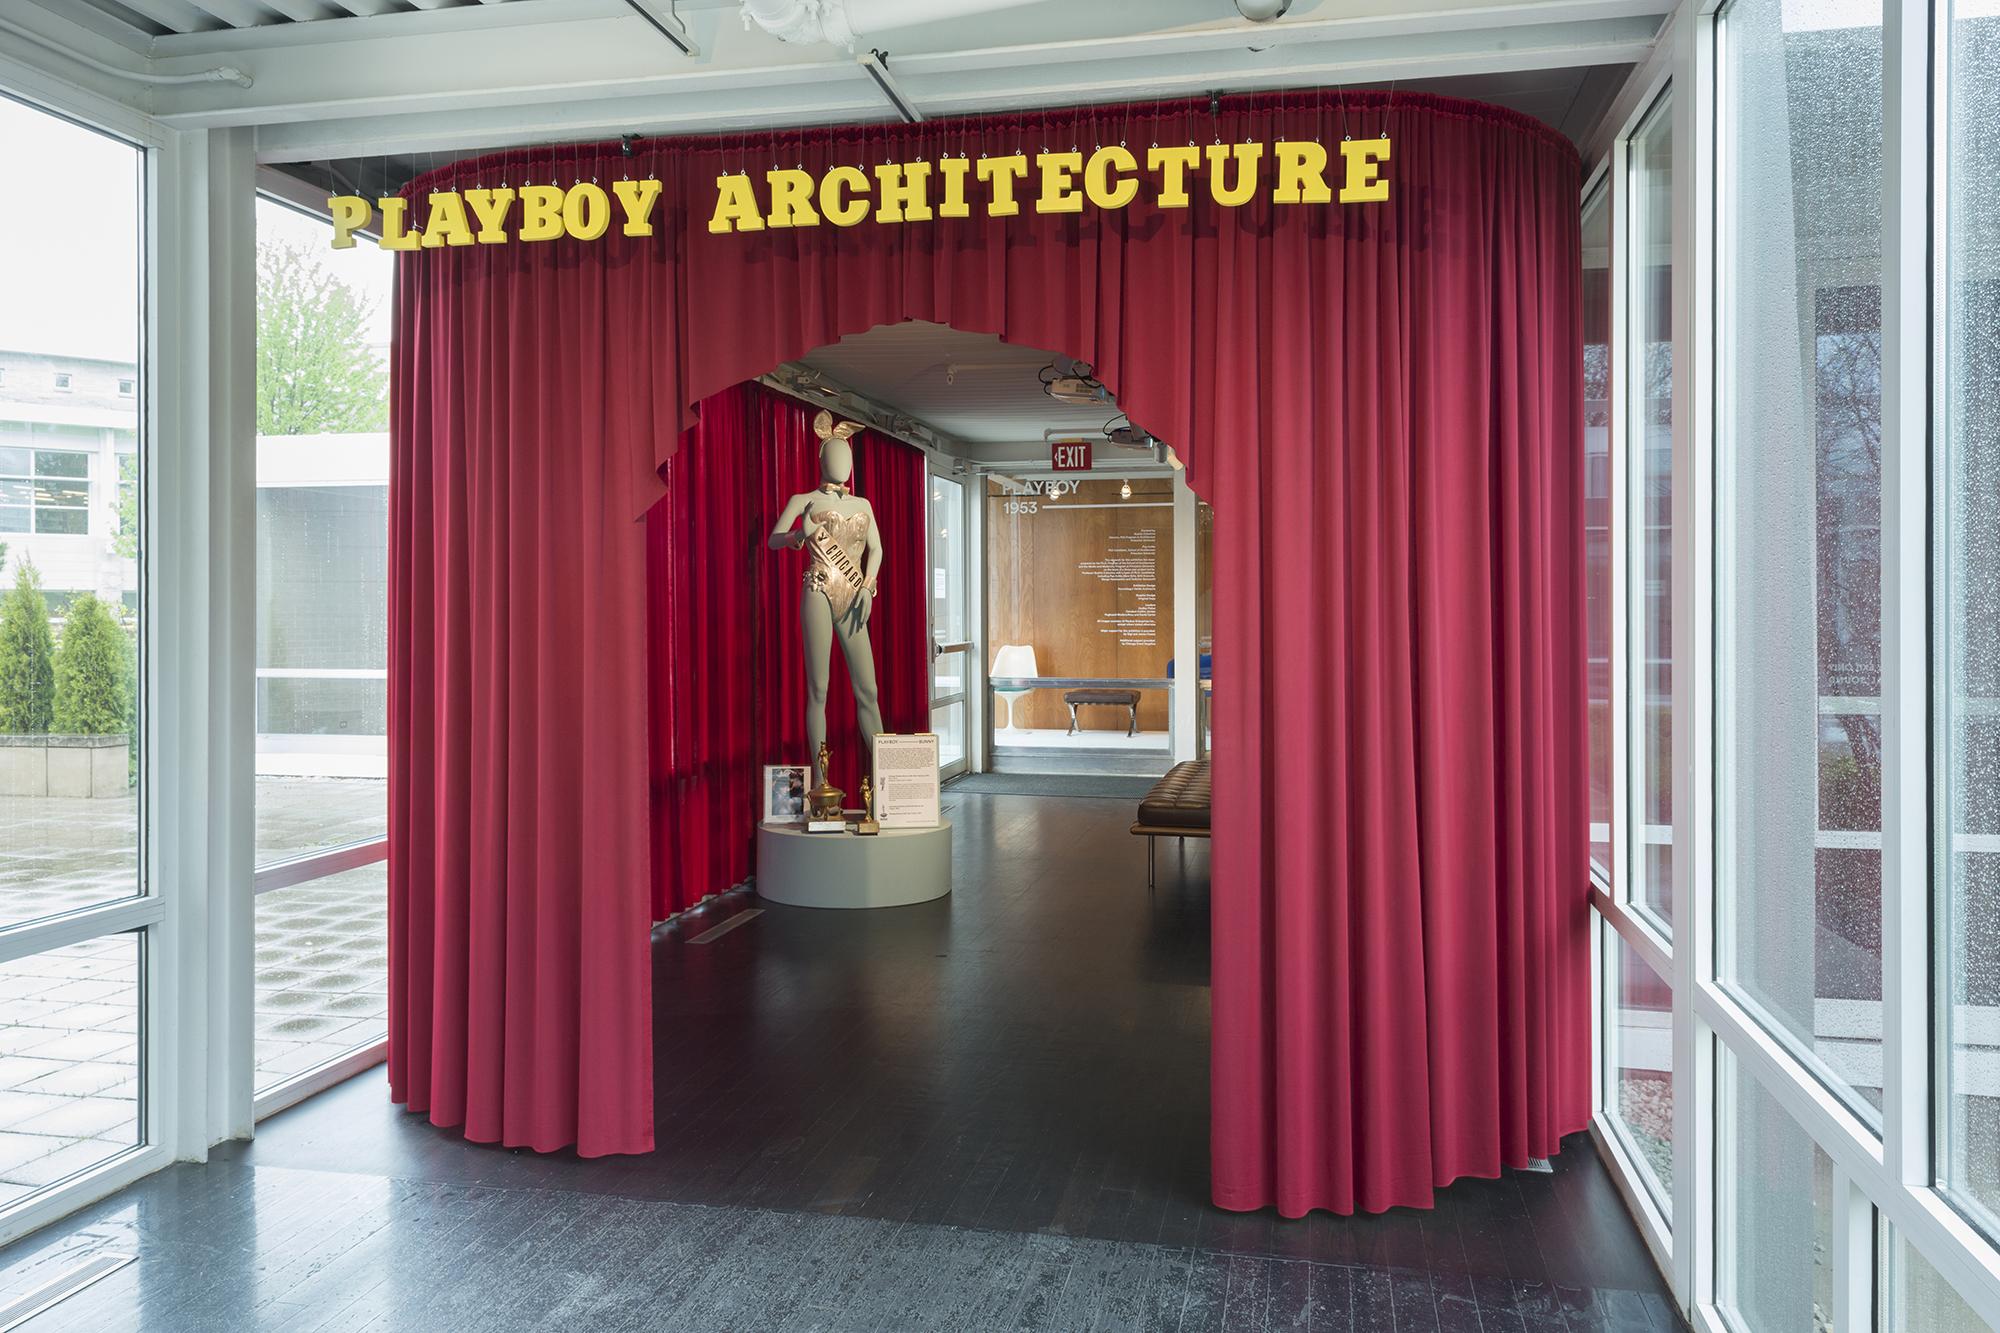 Did Playboy Mainstream Modernism Architect Magazine